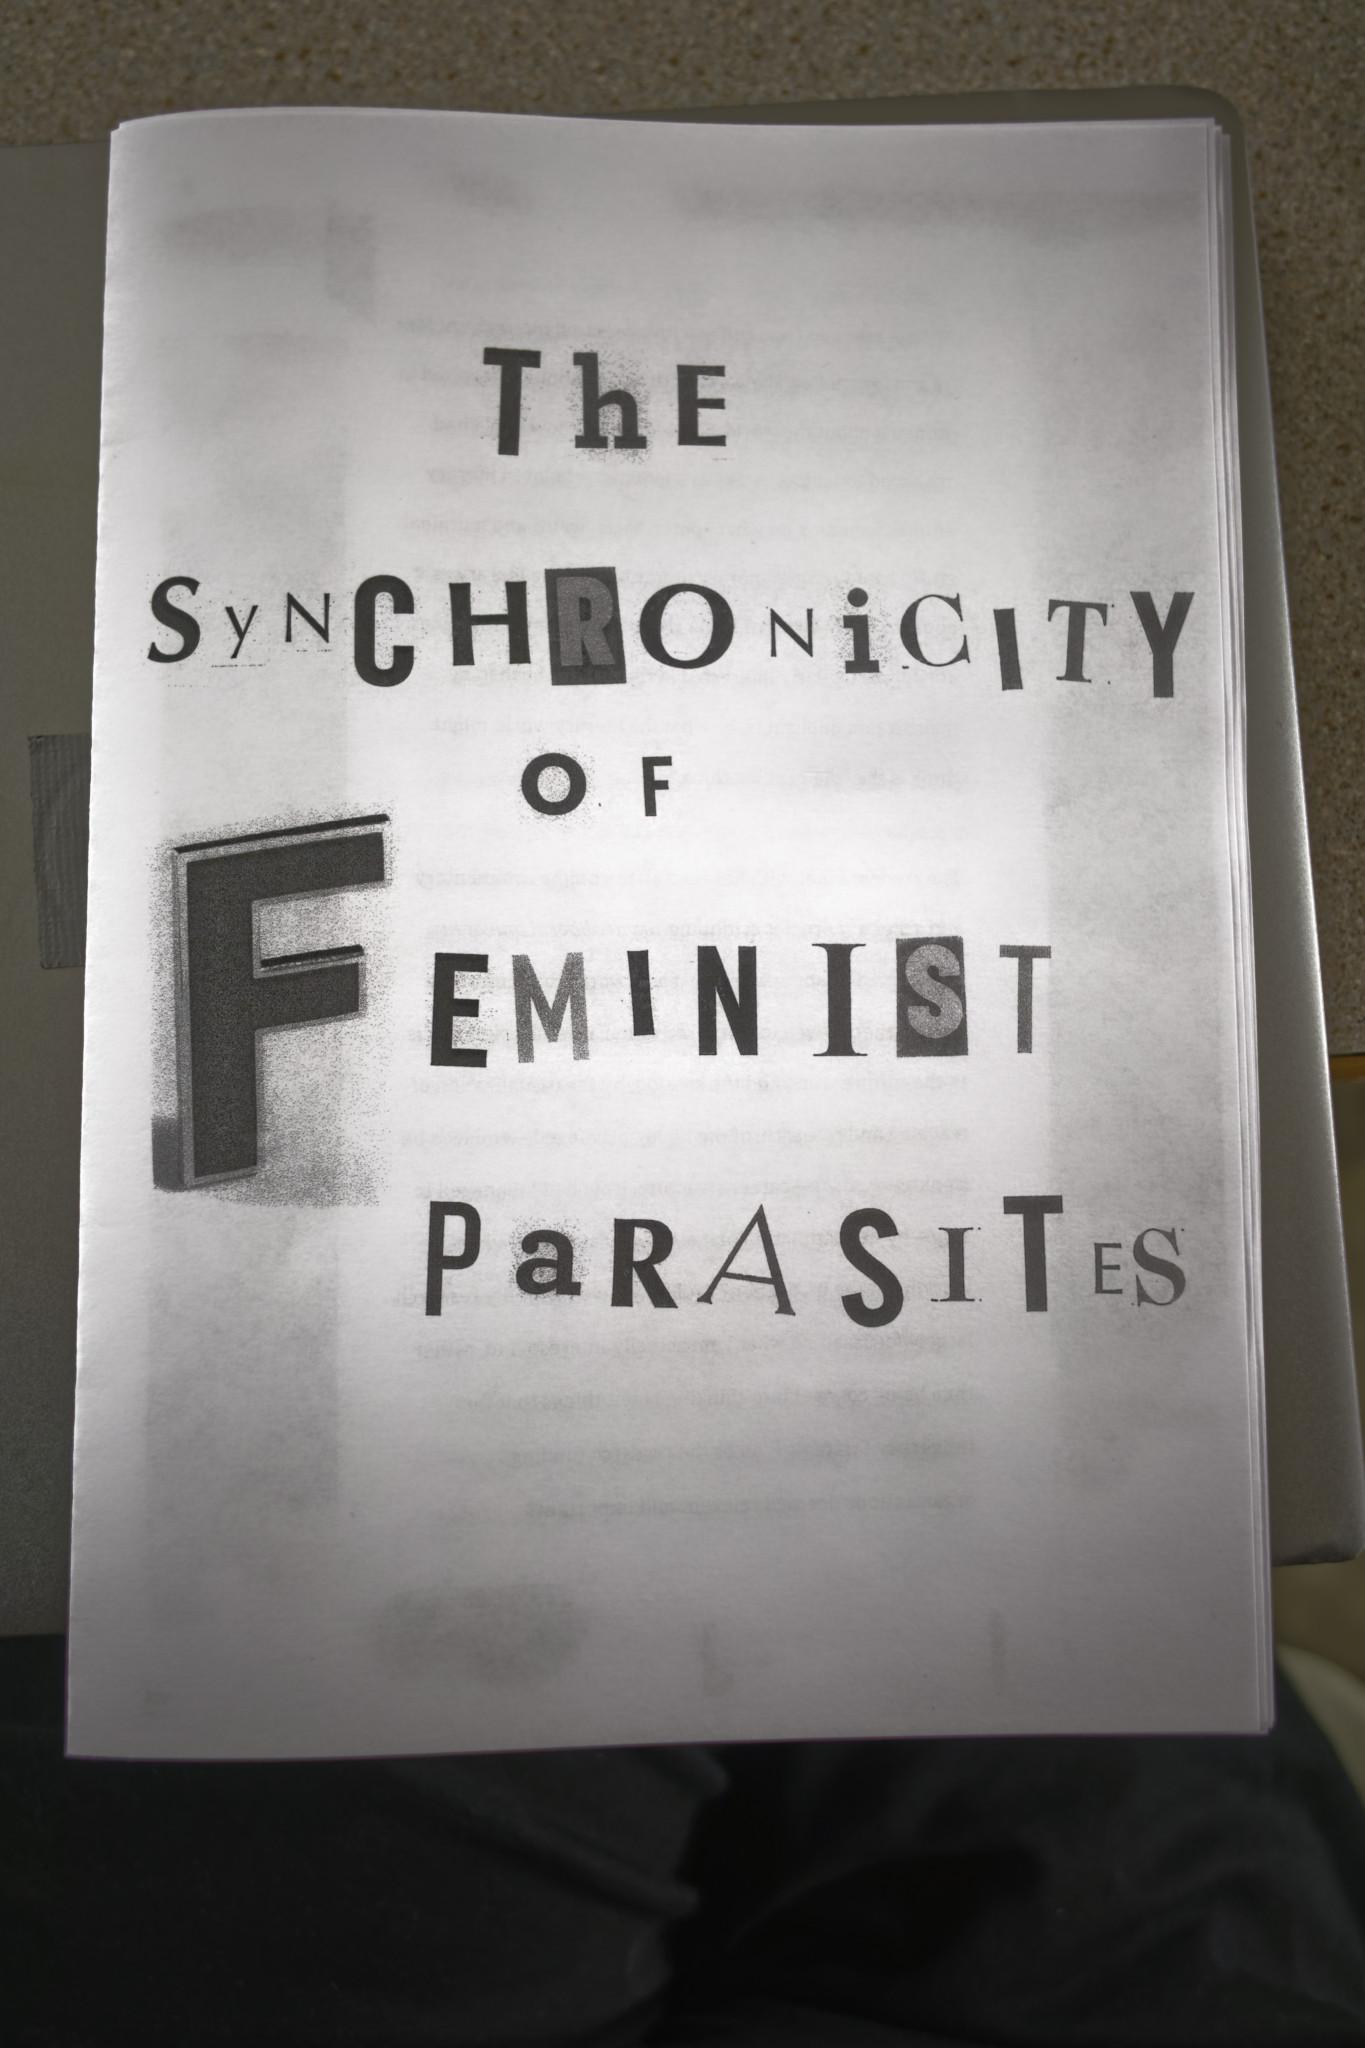 Synchronicity of Feminist Parasites